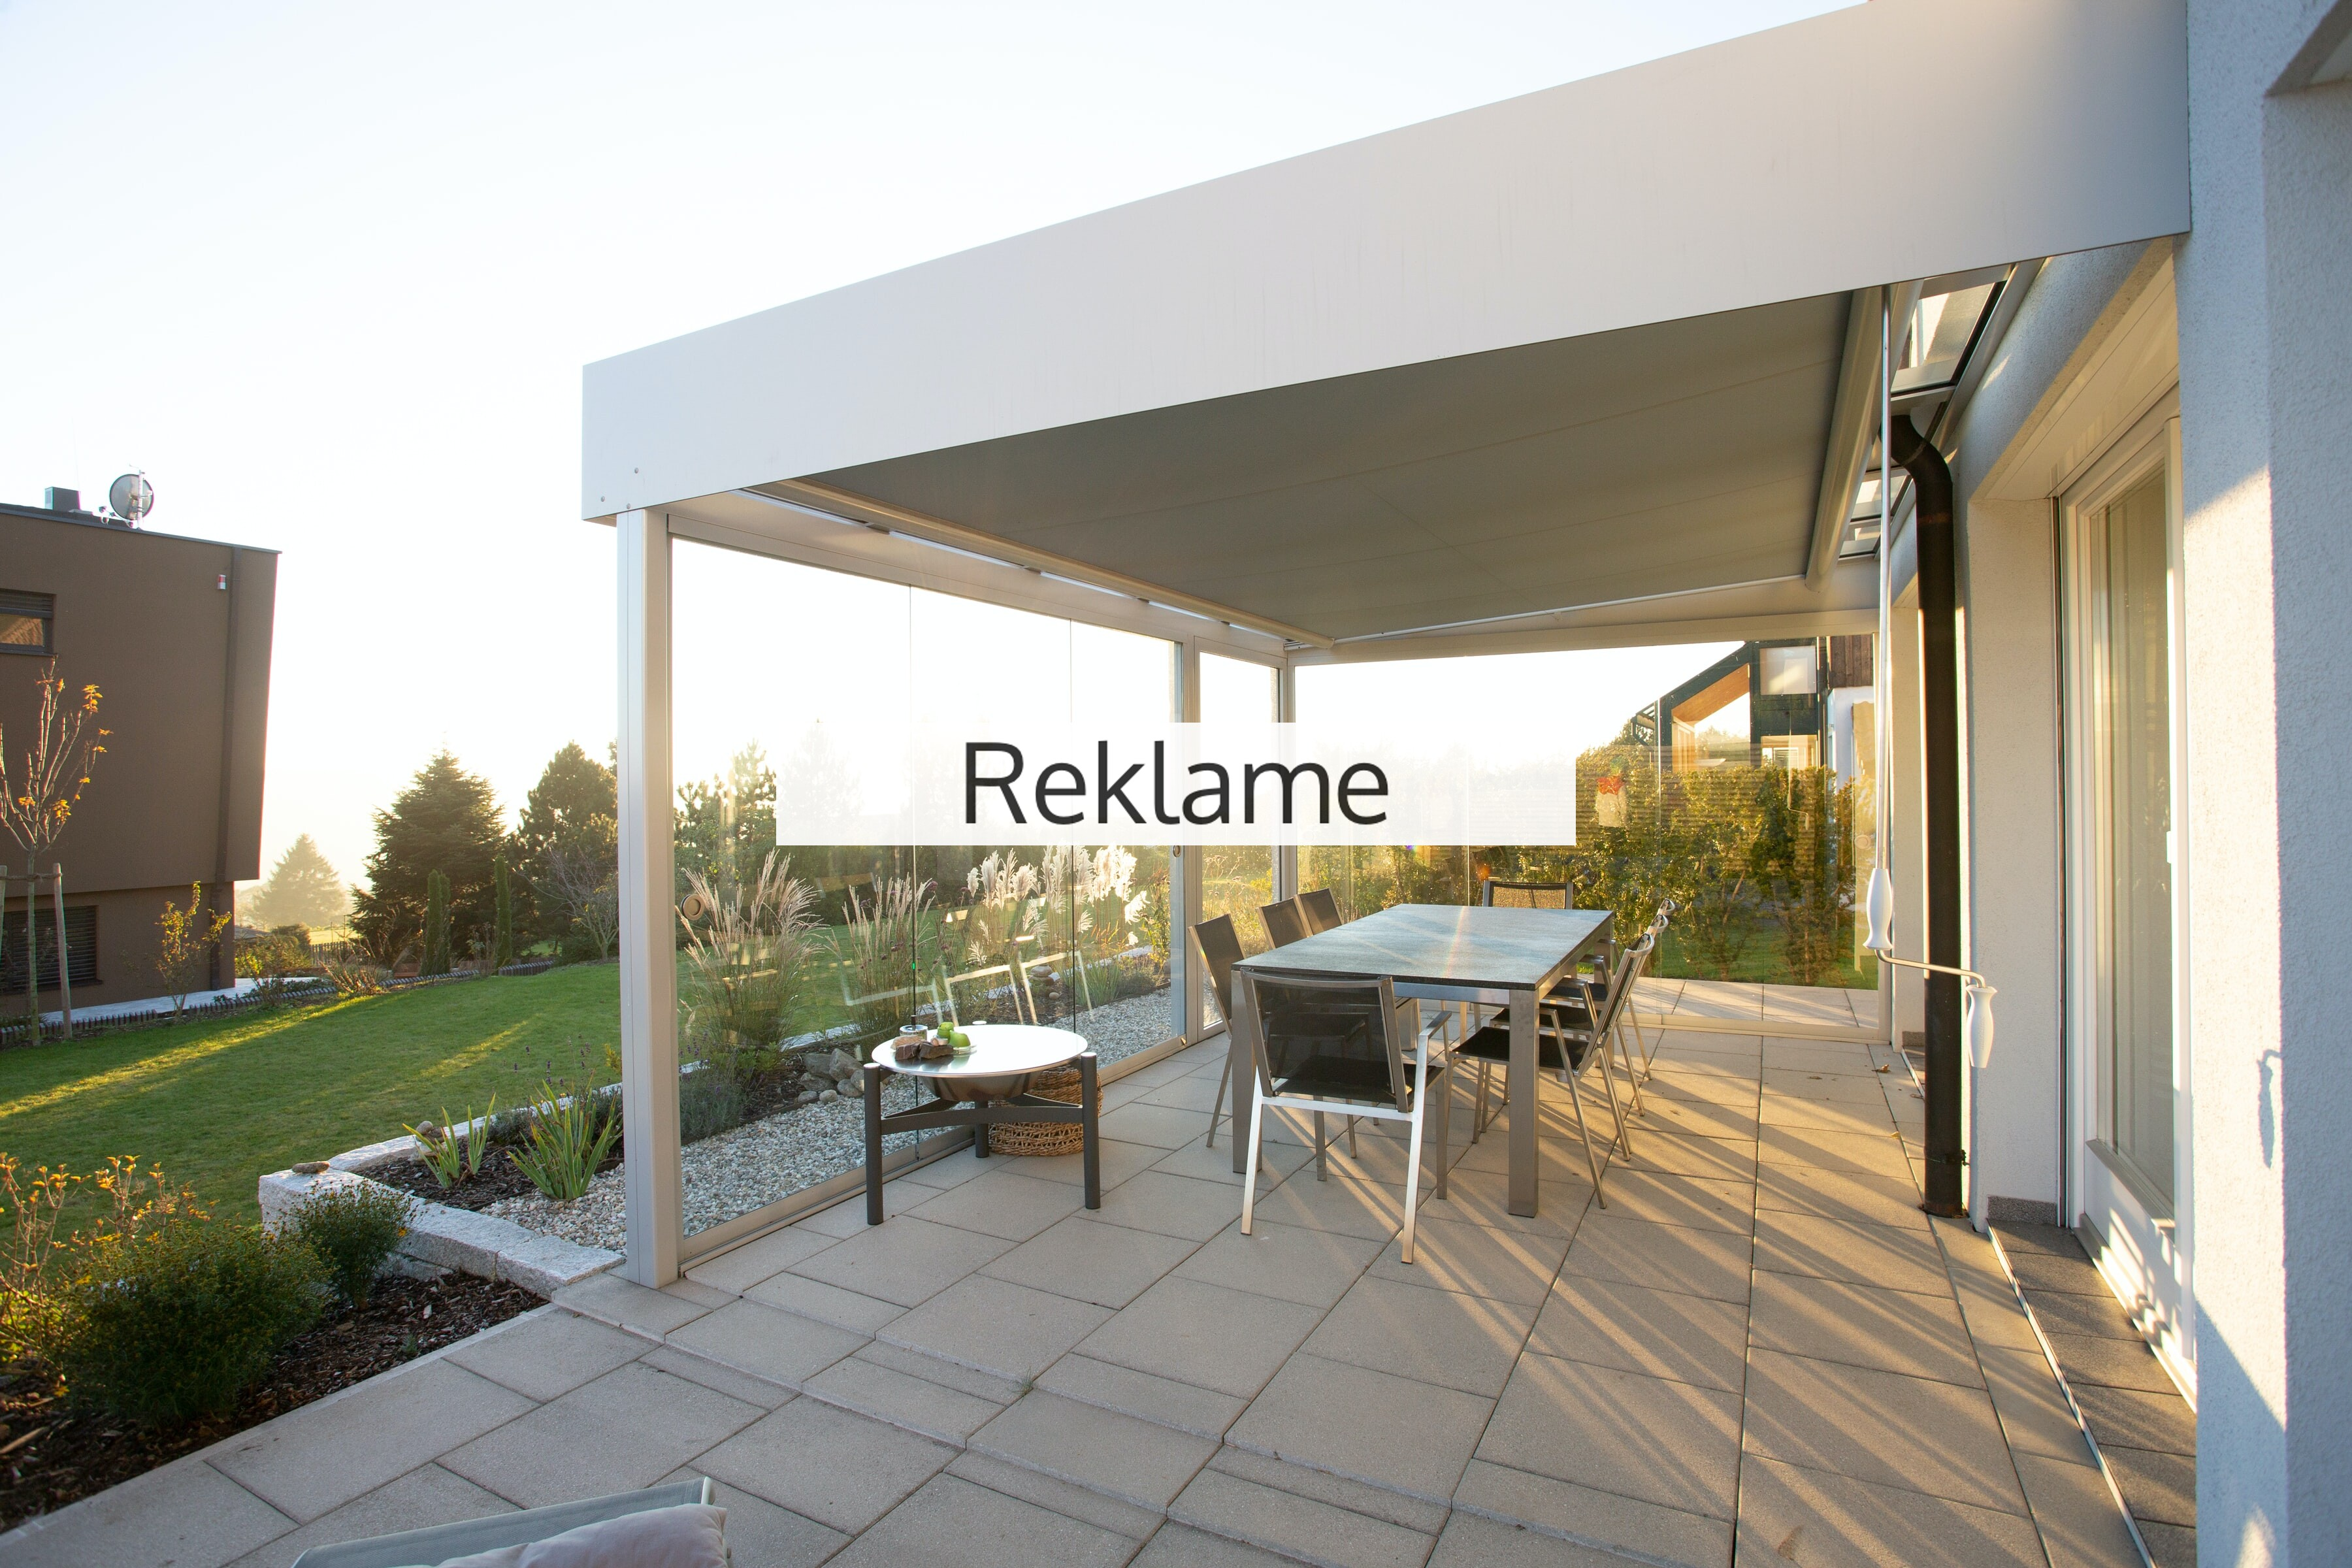 Sådan får du hurtigt fat i en god terrassevarmer